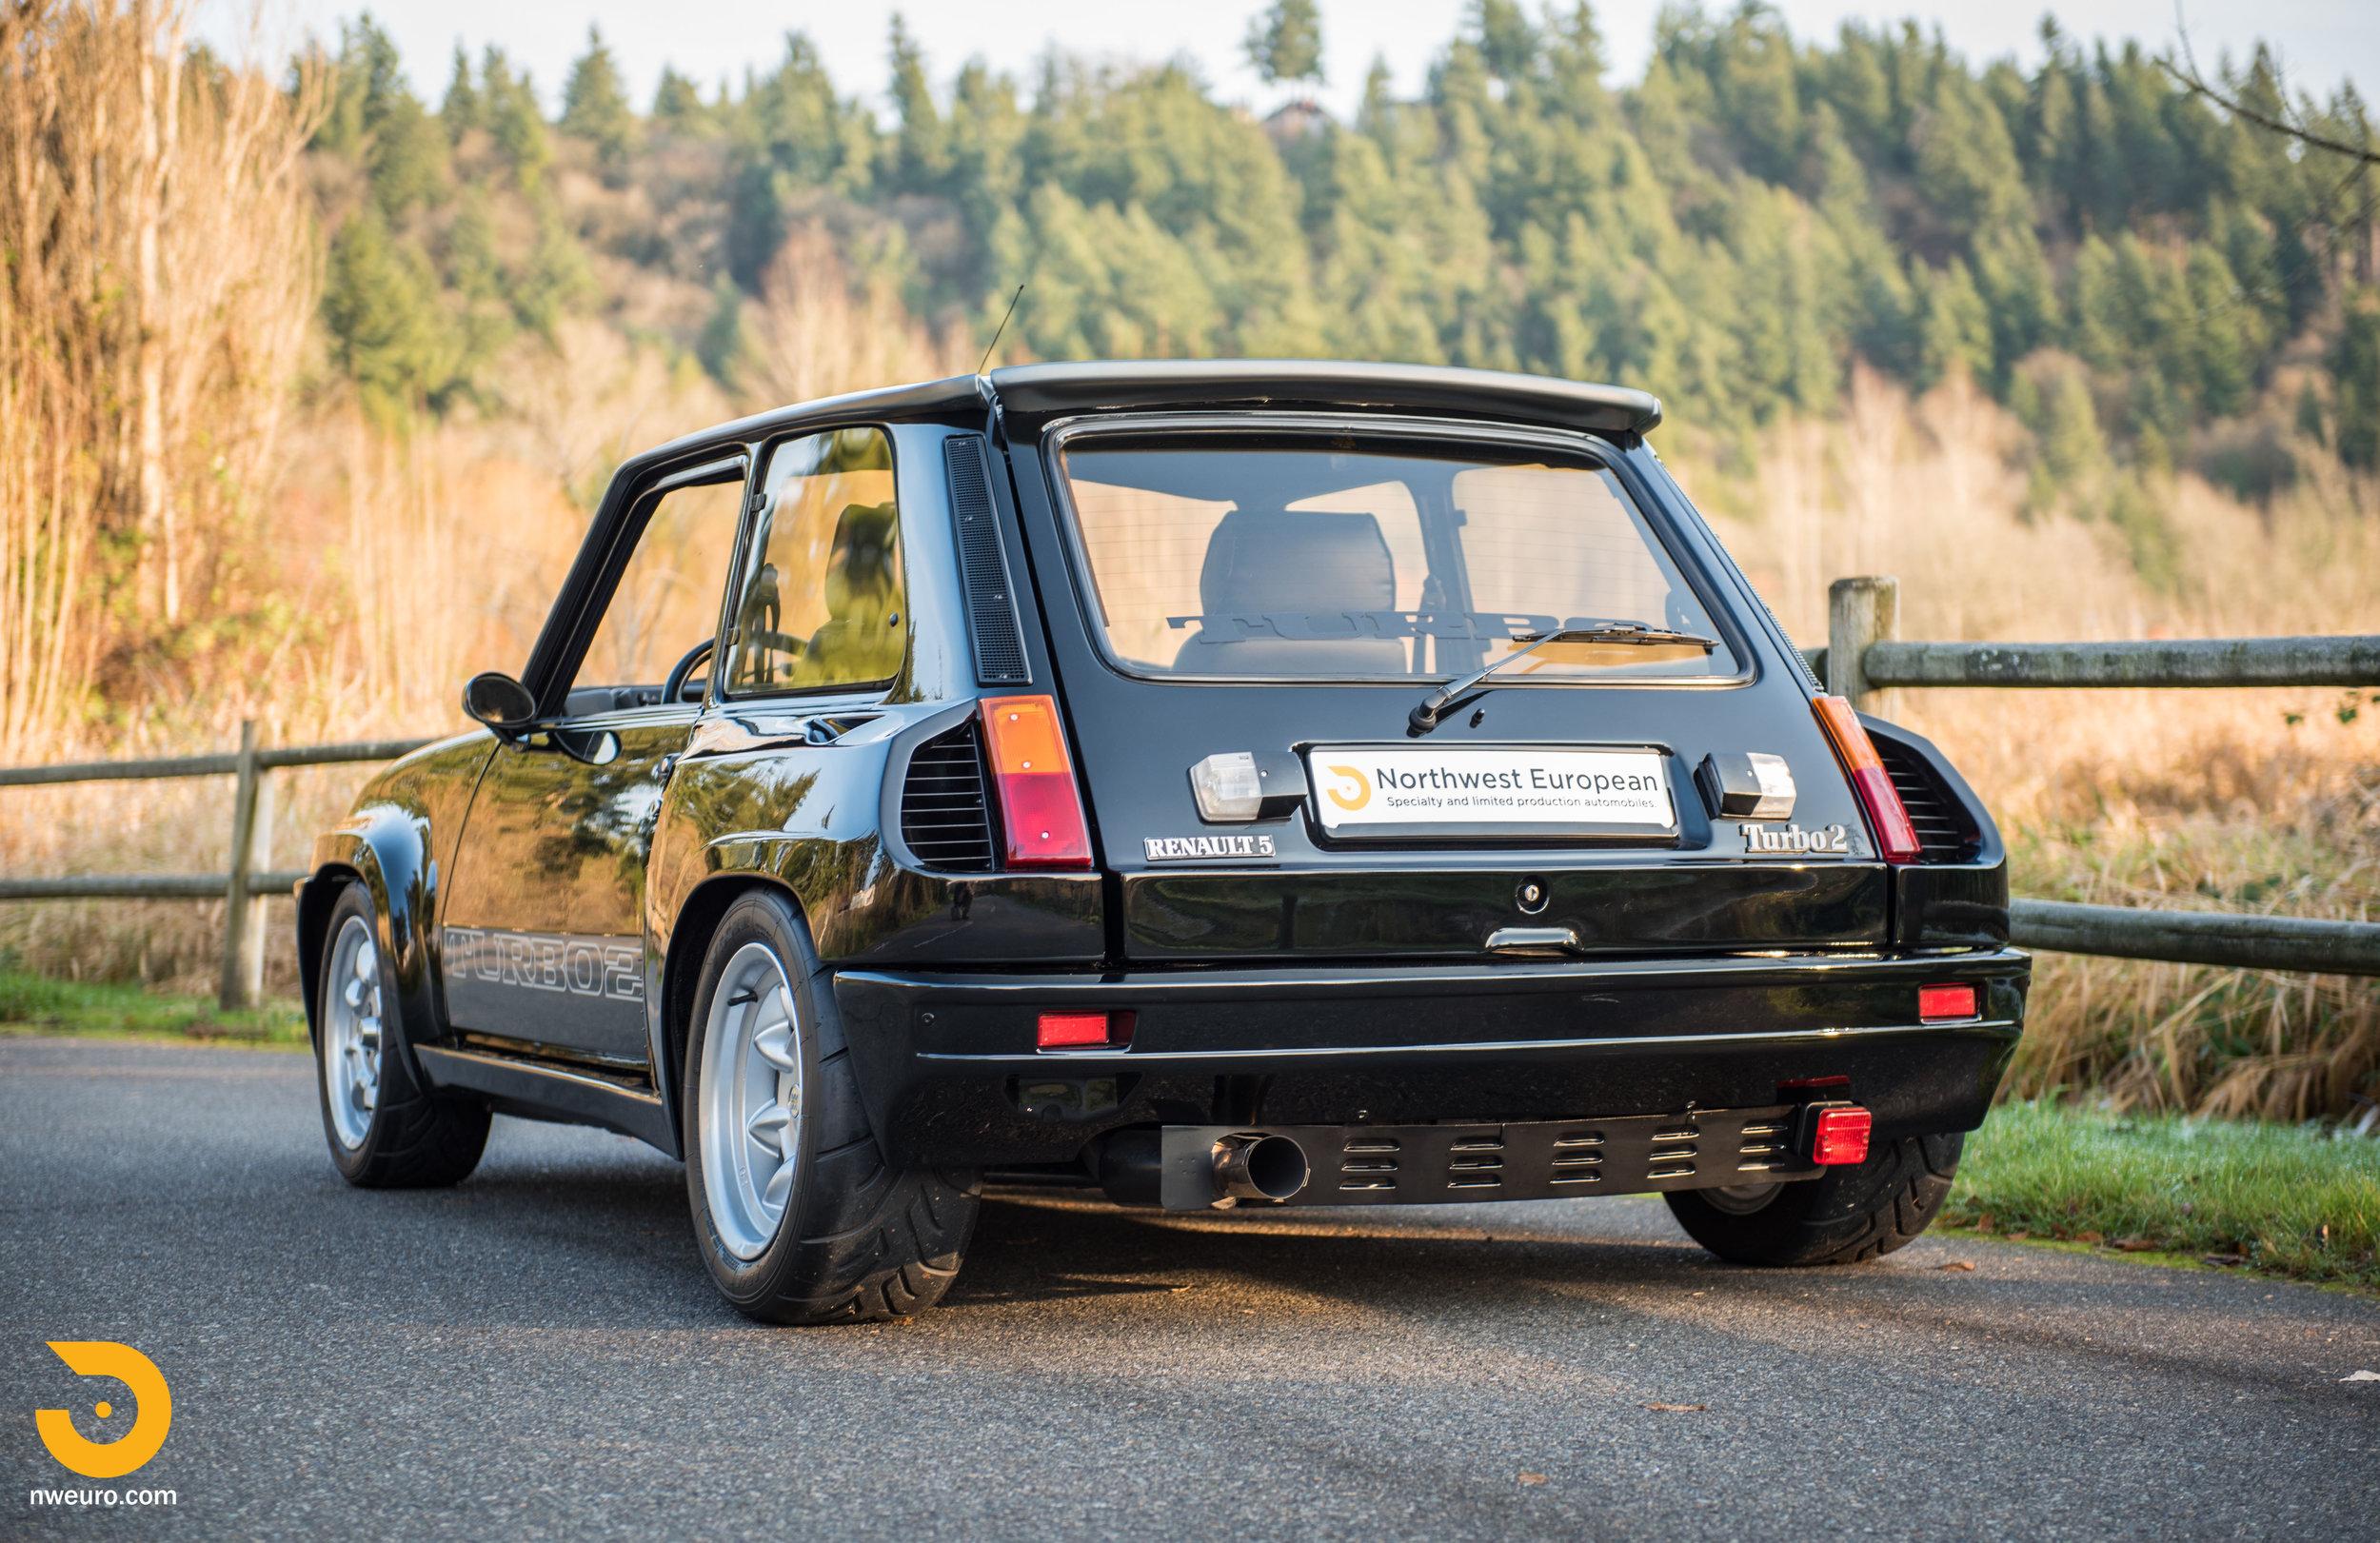 1983 Renault R5 Turbo 2 Black at Park-14.jpg